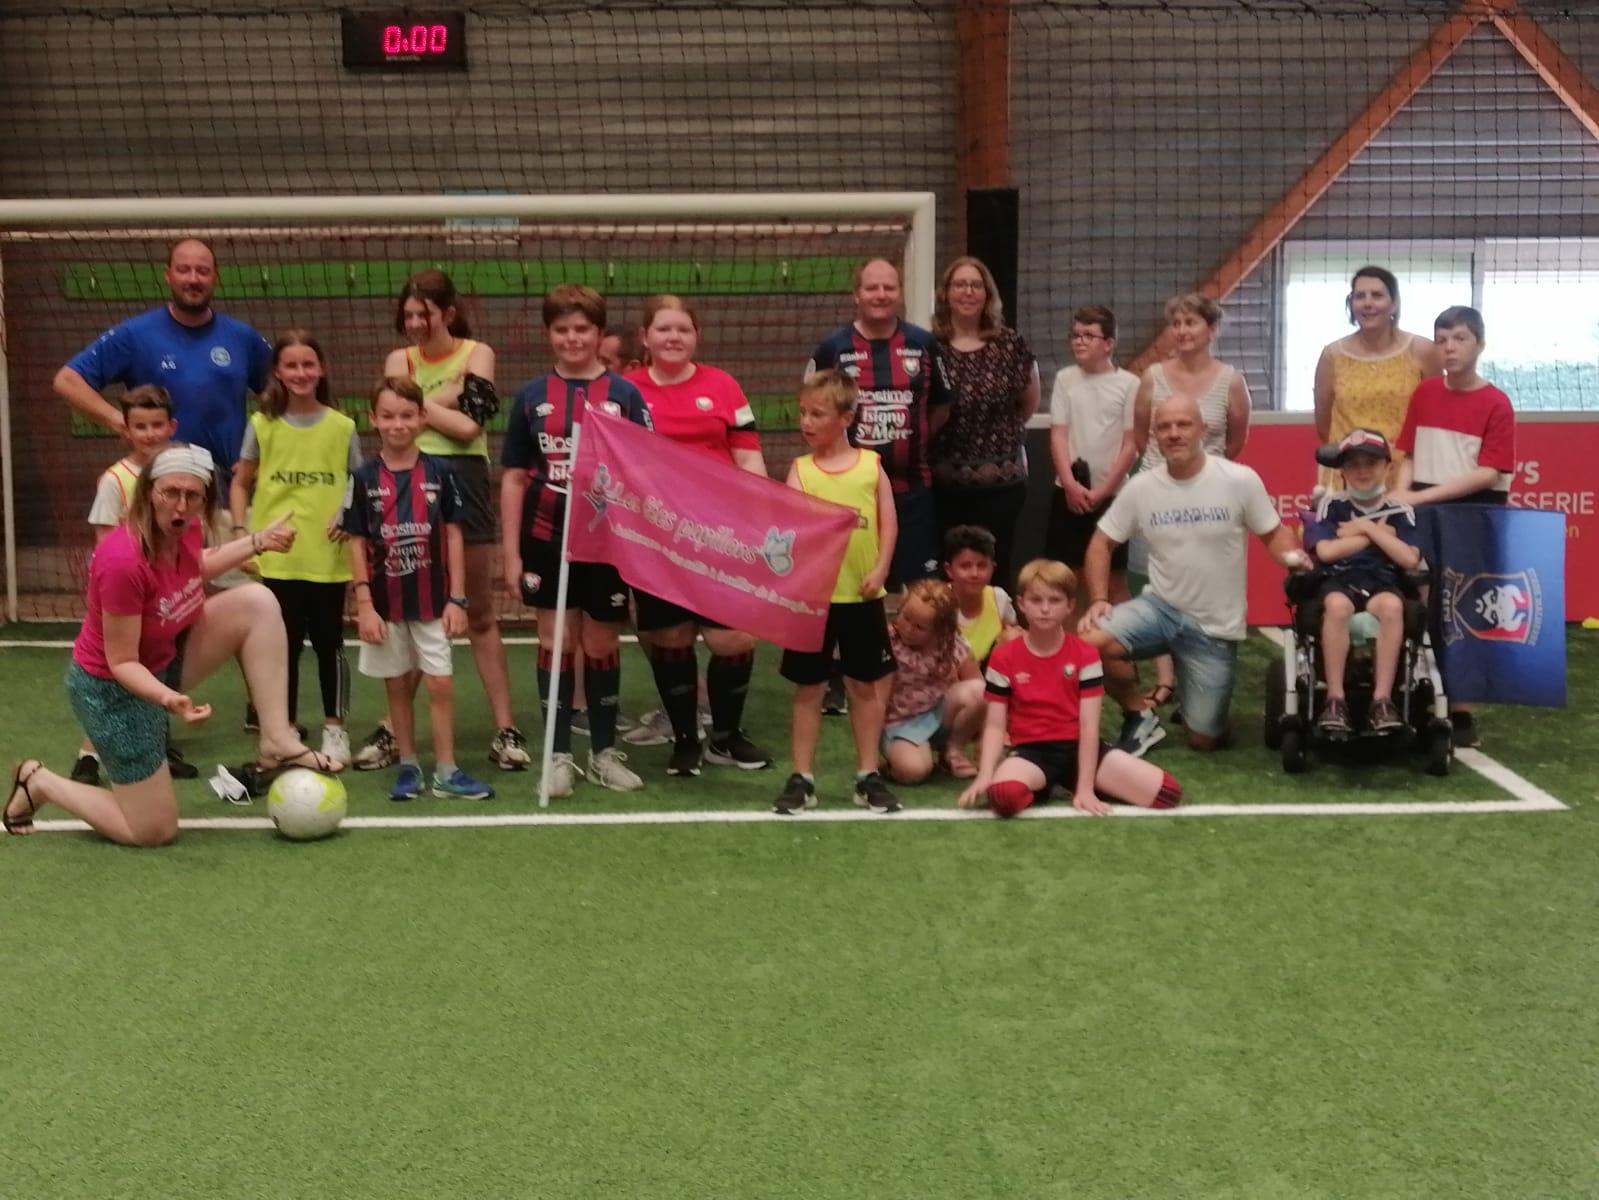 Futsal au Five